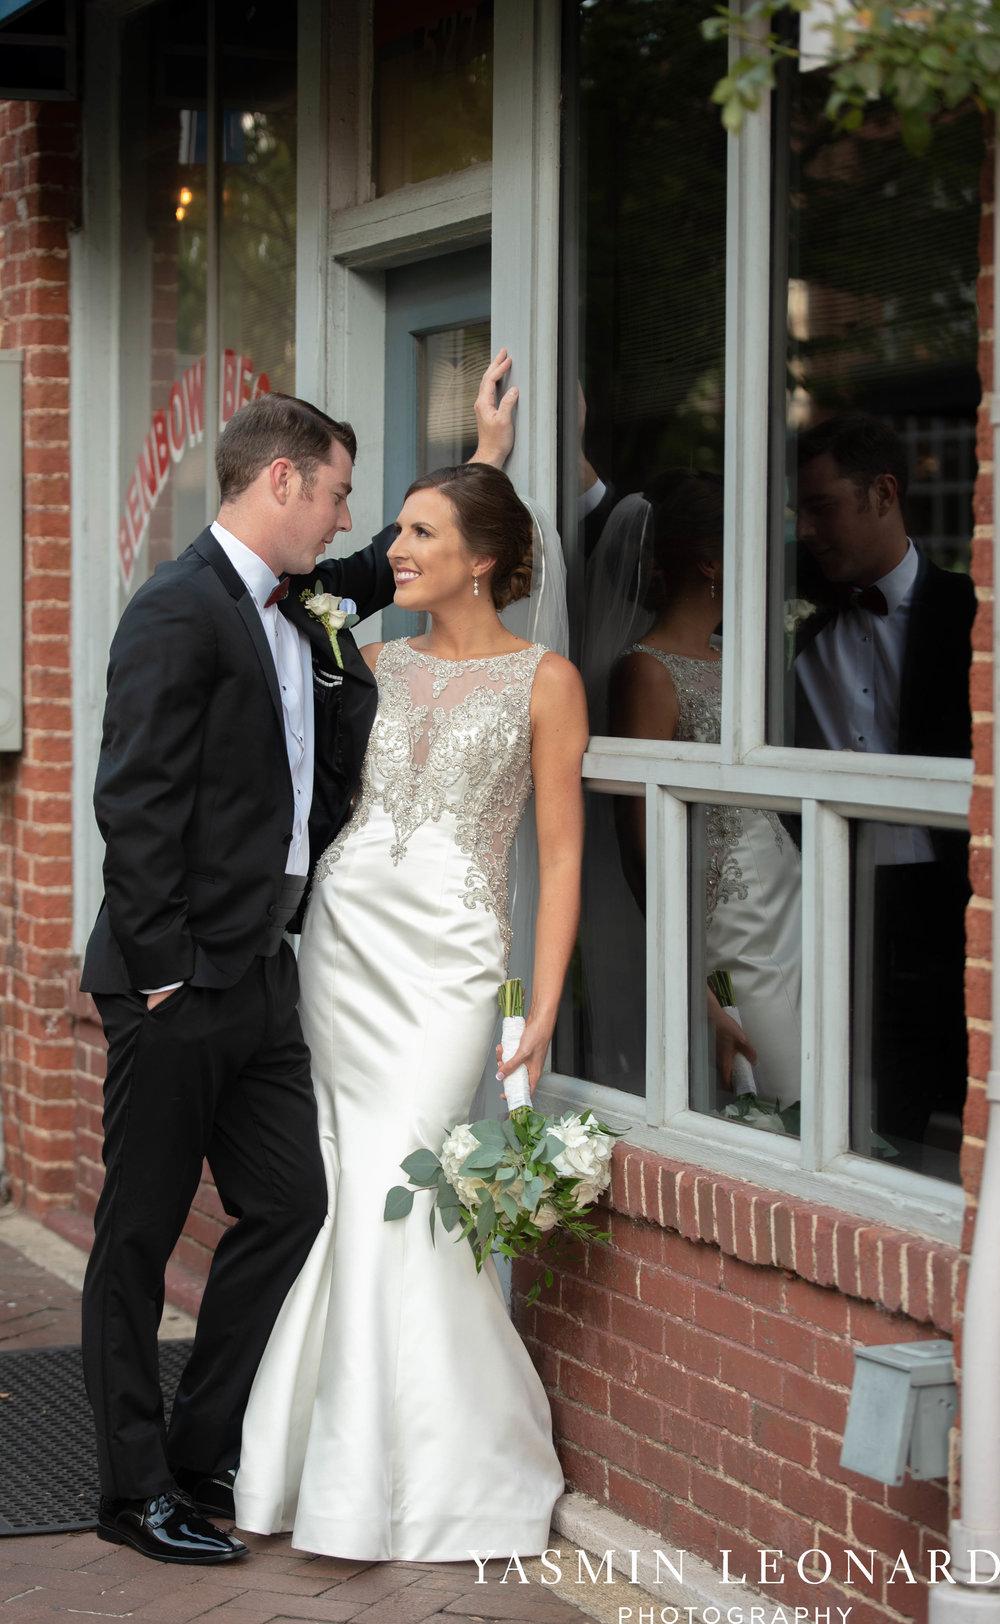 Millennium Center Wedding - Downtown Winston Salem - Winston Salem Wedding Photographer - Winston Salem Venues - Indoor Wedding Venues - NC Wedding Photographer - Yasmin Leonard Photography-31.jpg